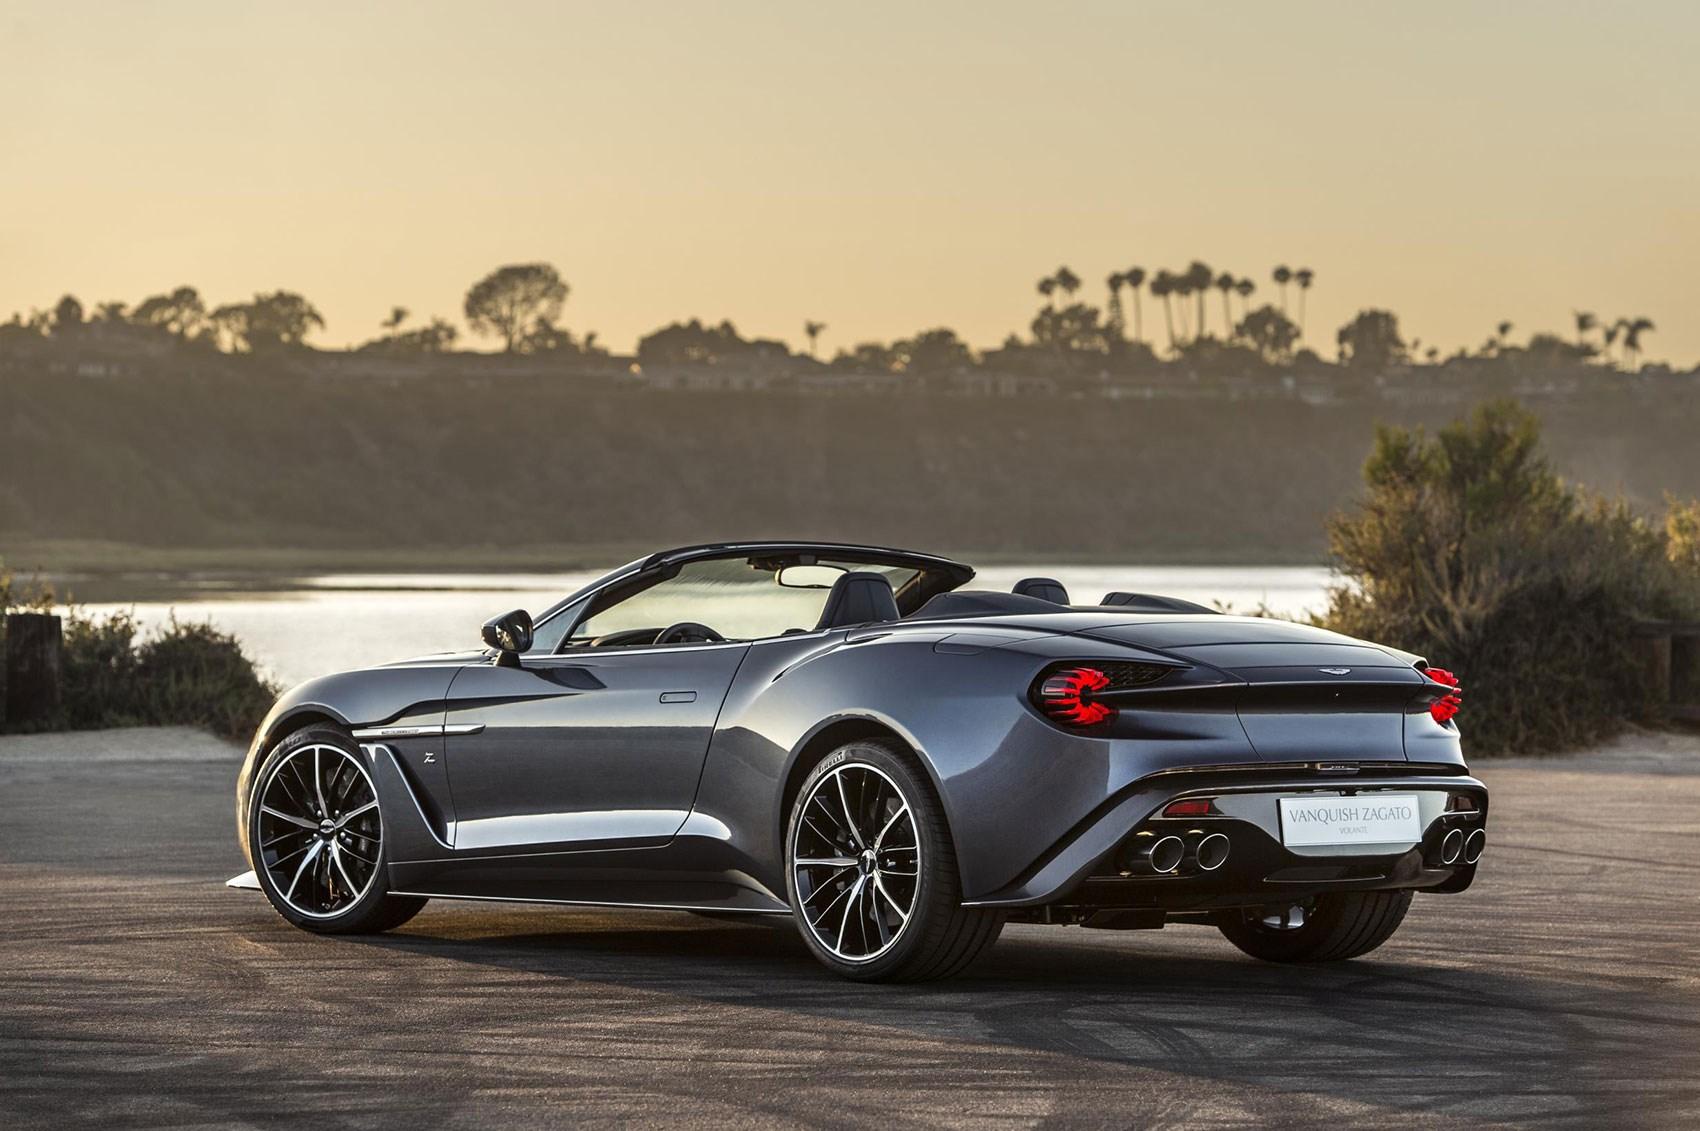 Aston Martin Vanquish Zagato Shooting Brake And Speedster In